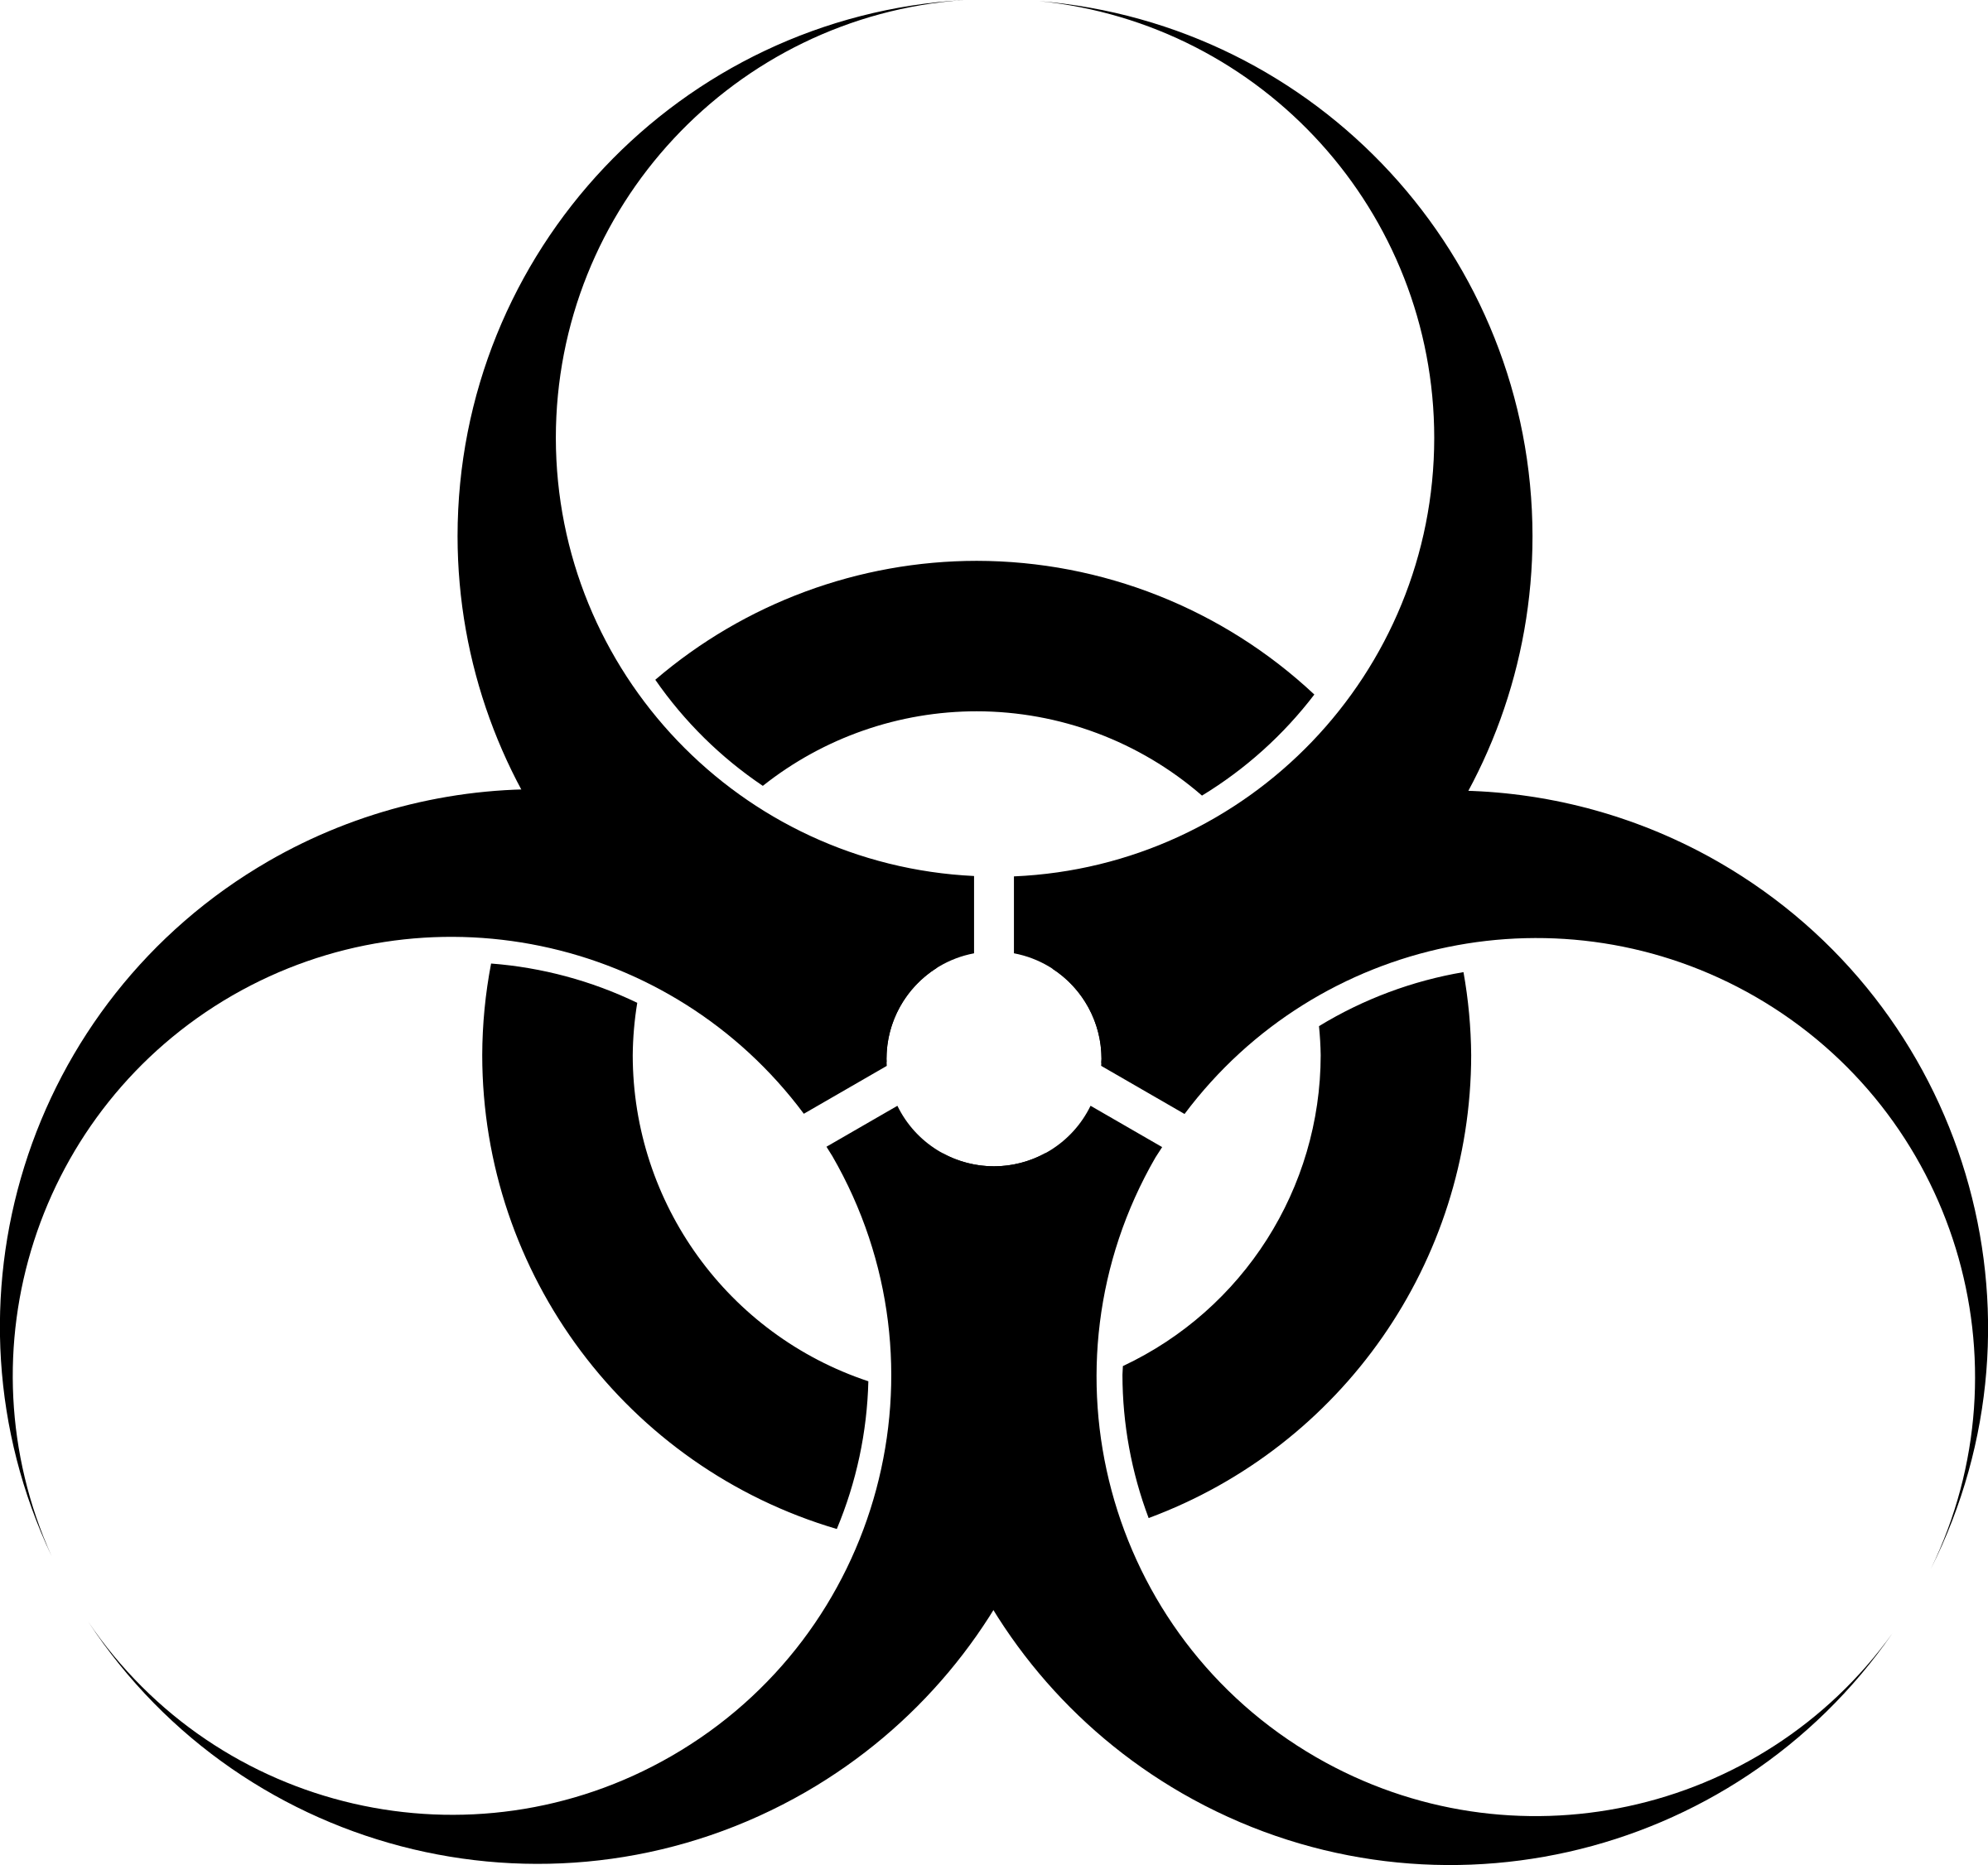 Clipart Biohazard Symbol